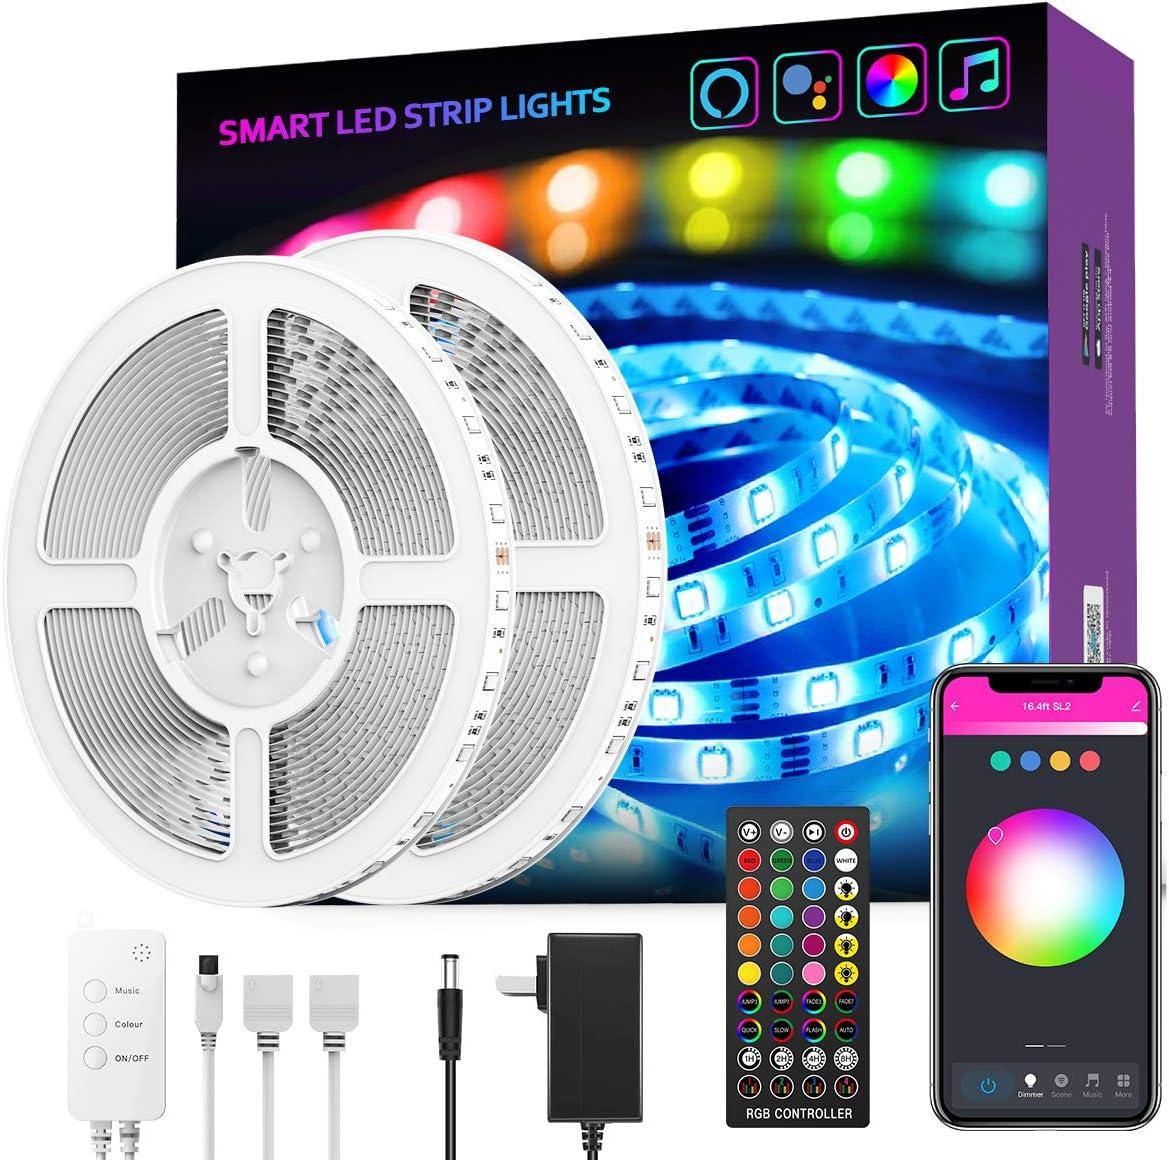 LED Max Selling 48% OFF Light Strip GroHome 32.8ft WiFi Smart Kit Lights Work